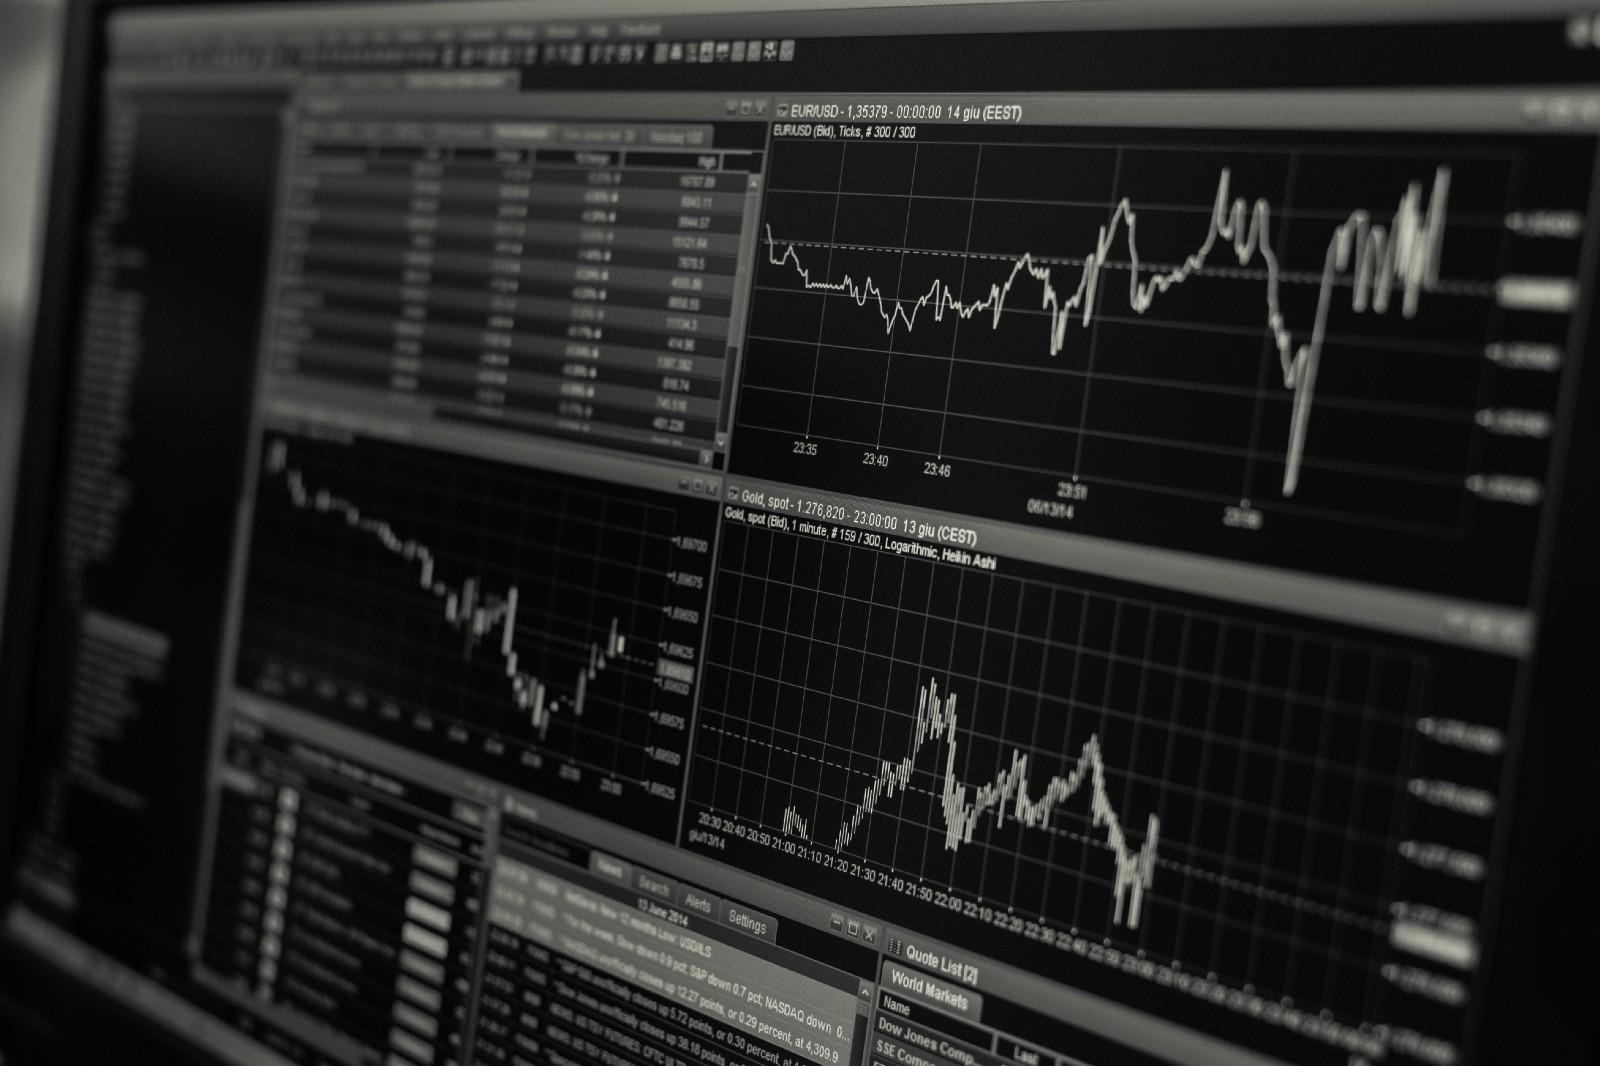 /evaluating-crypto-portfolio-performance-based-on-asset-market-capitalization-2a216f179276 feature image